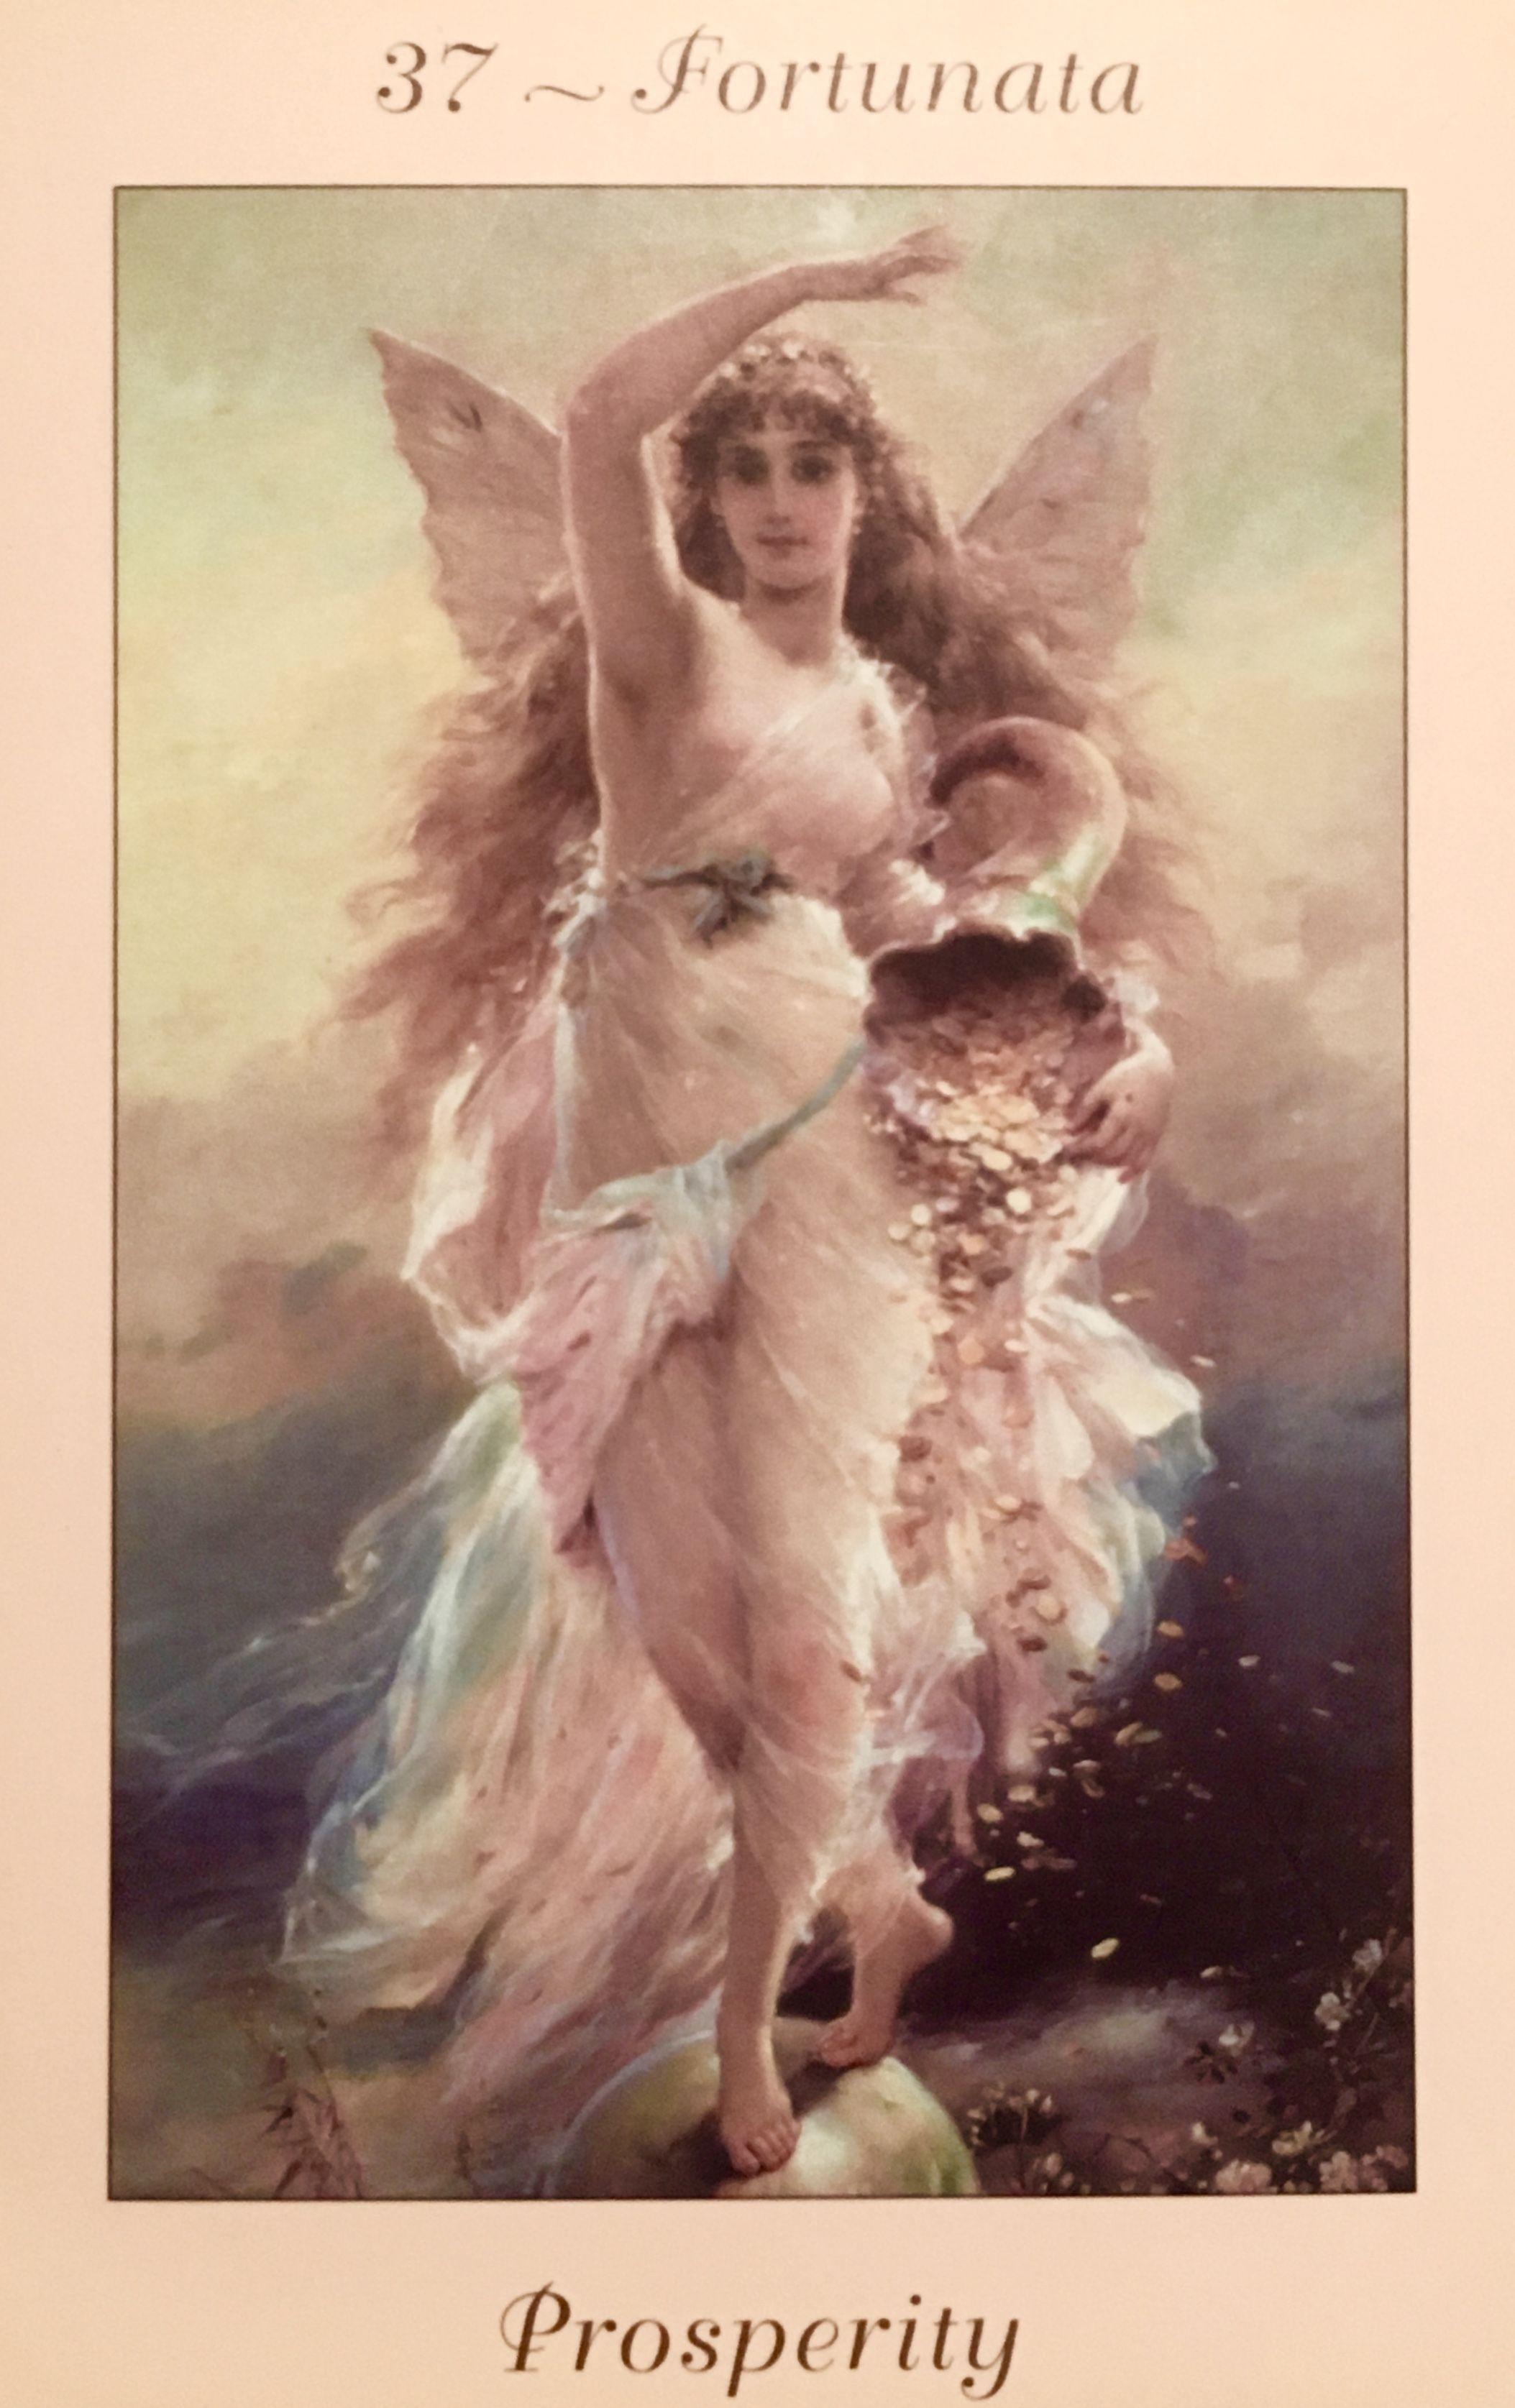 Certified angel card reader by doreen virtue radleigh